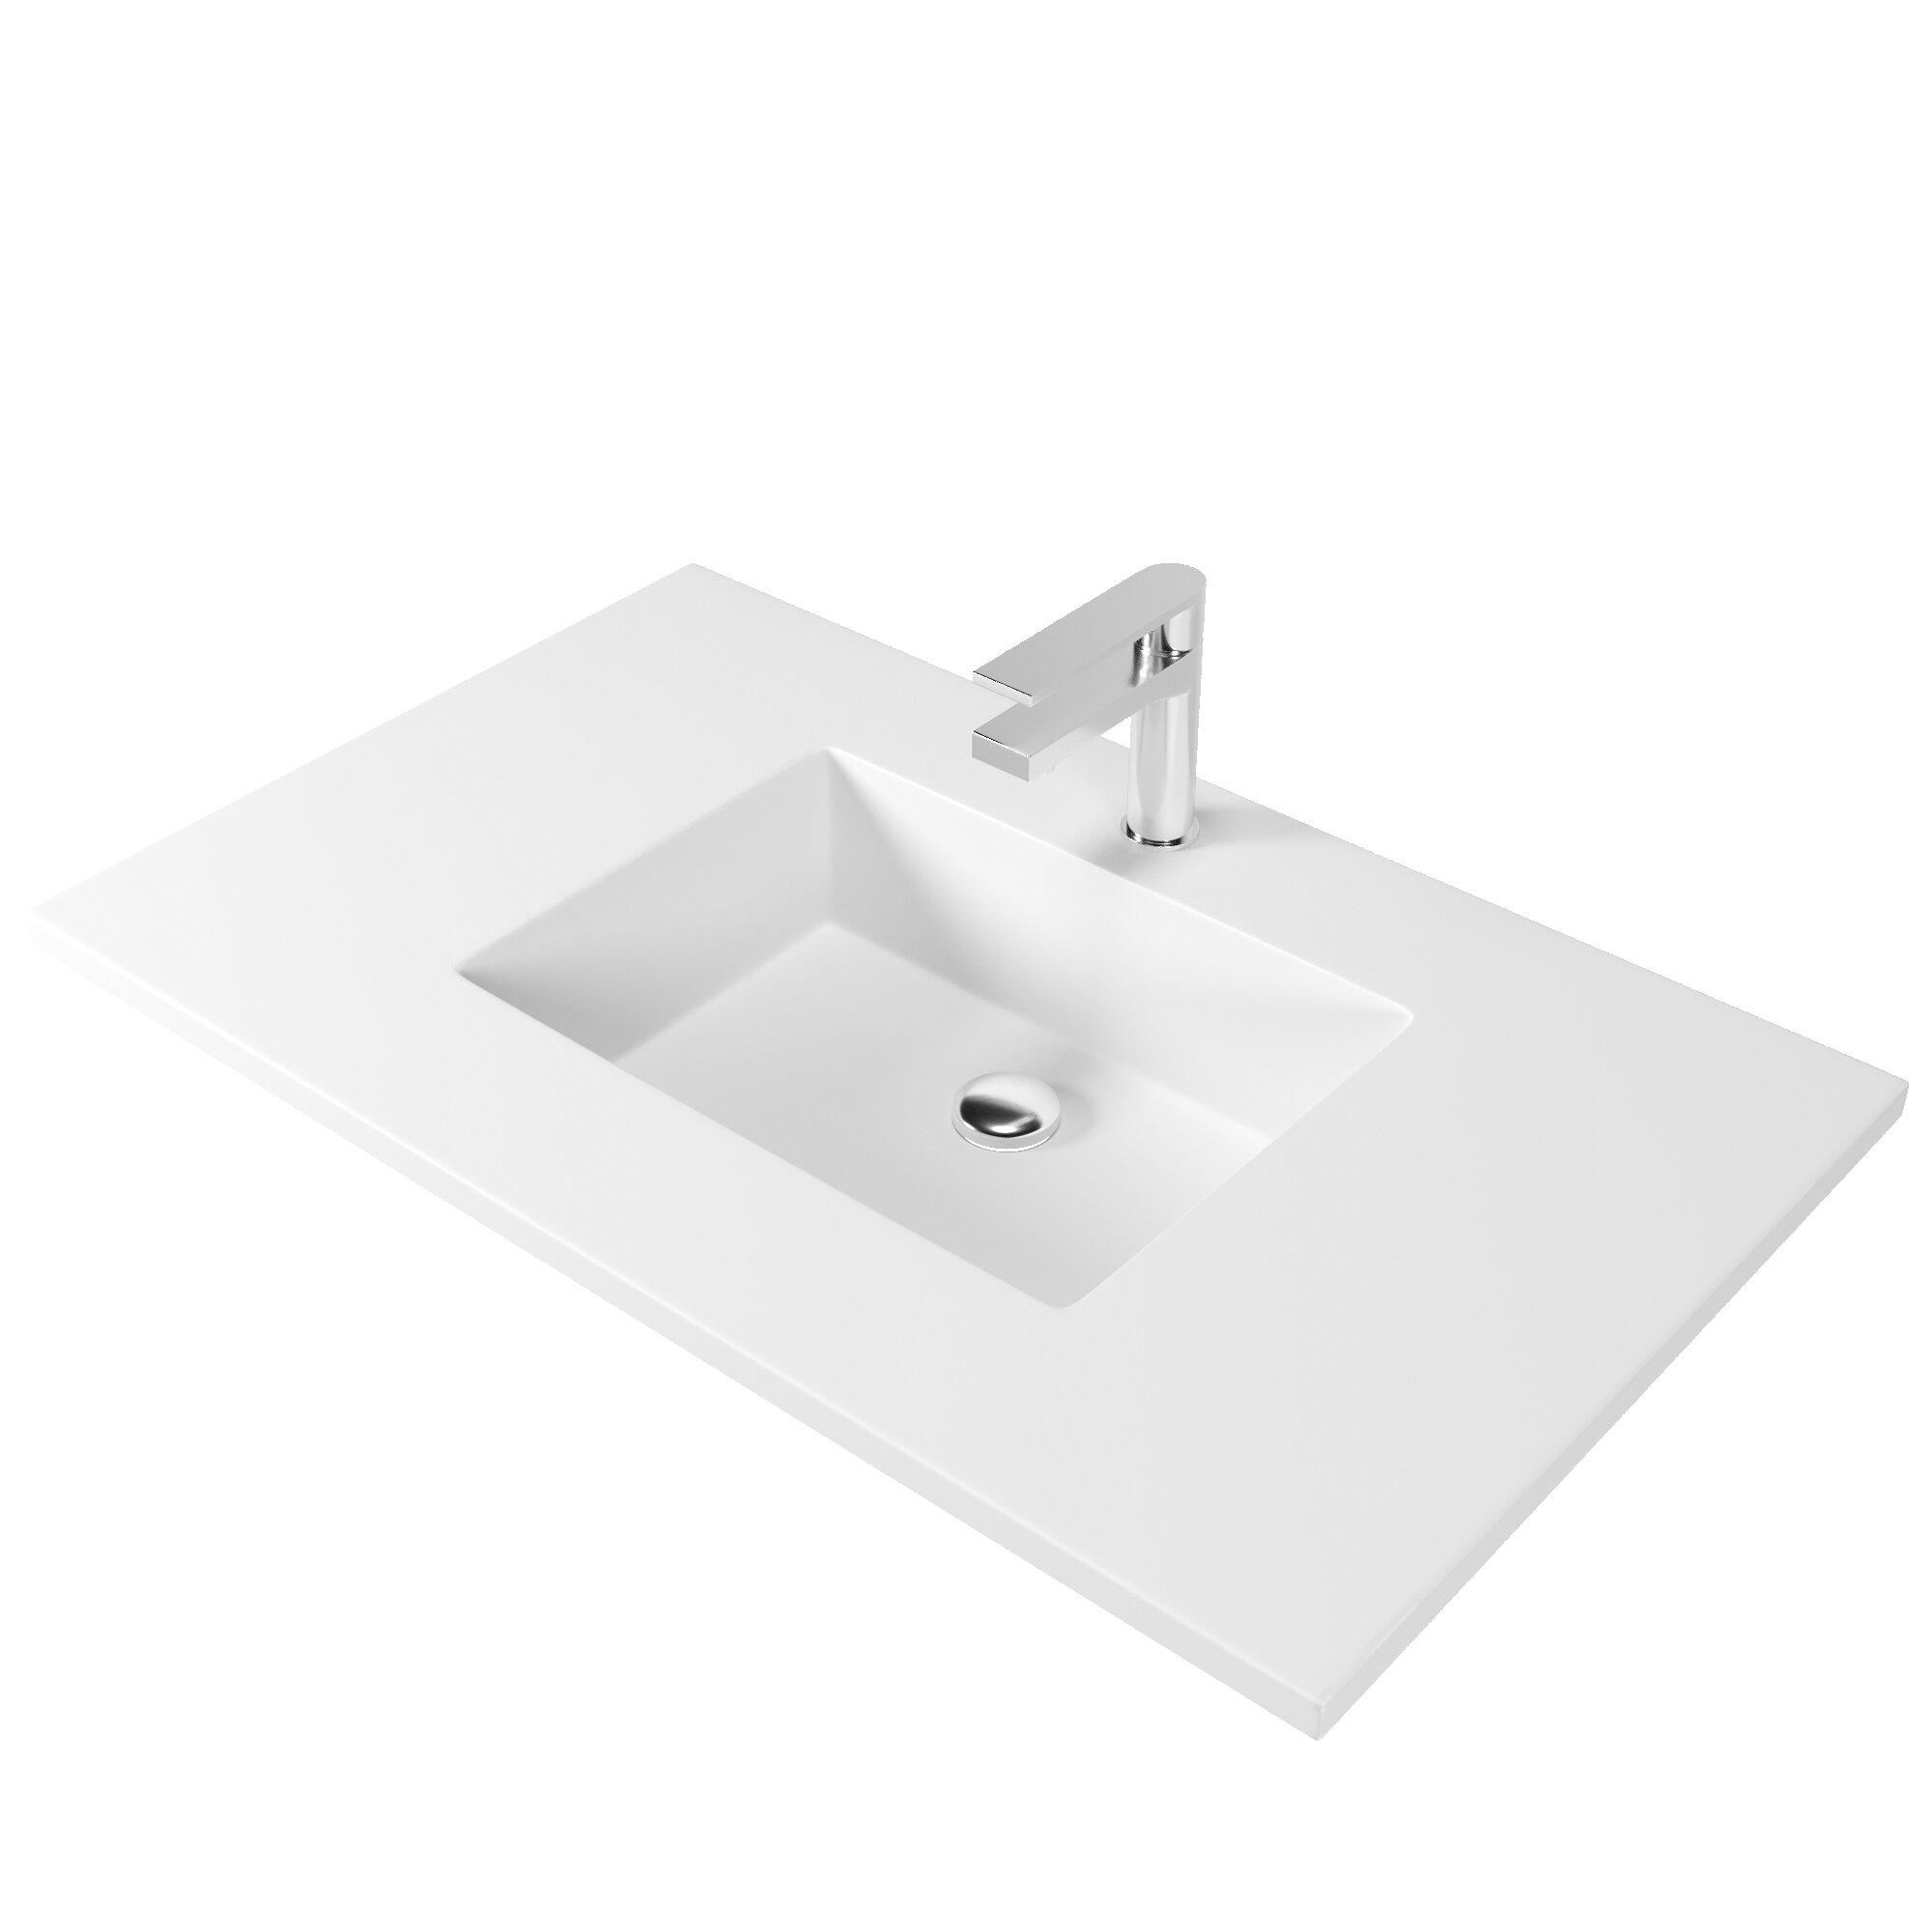 Castellousa 36 Single Bathroom Vanity Top With Sink Reviews Wayfair